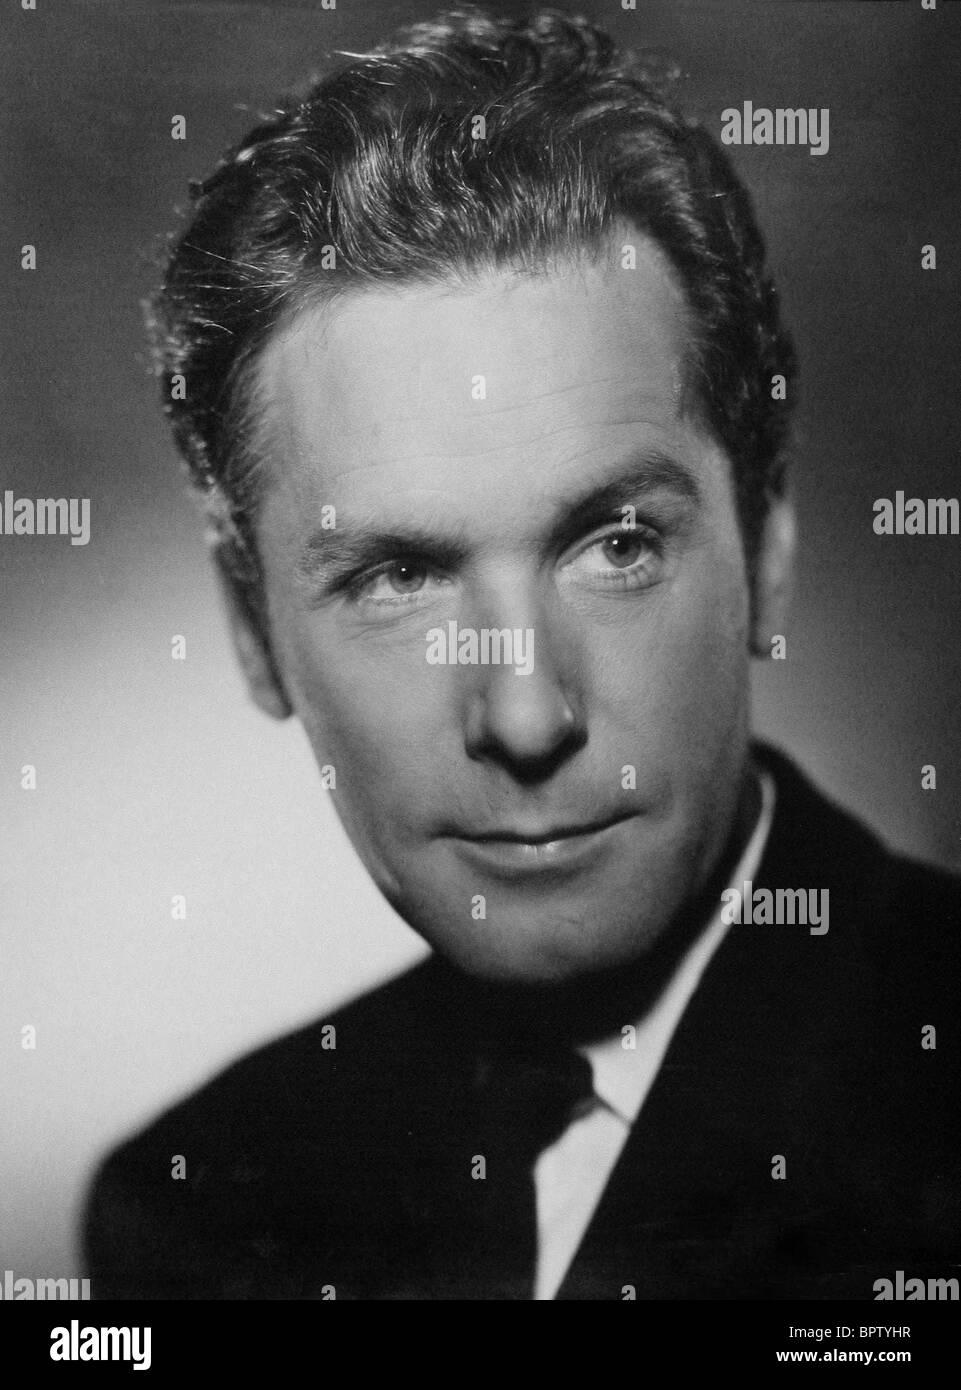 GRIFFITH JONES ACTOR (1947) - Stock Image